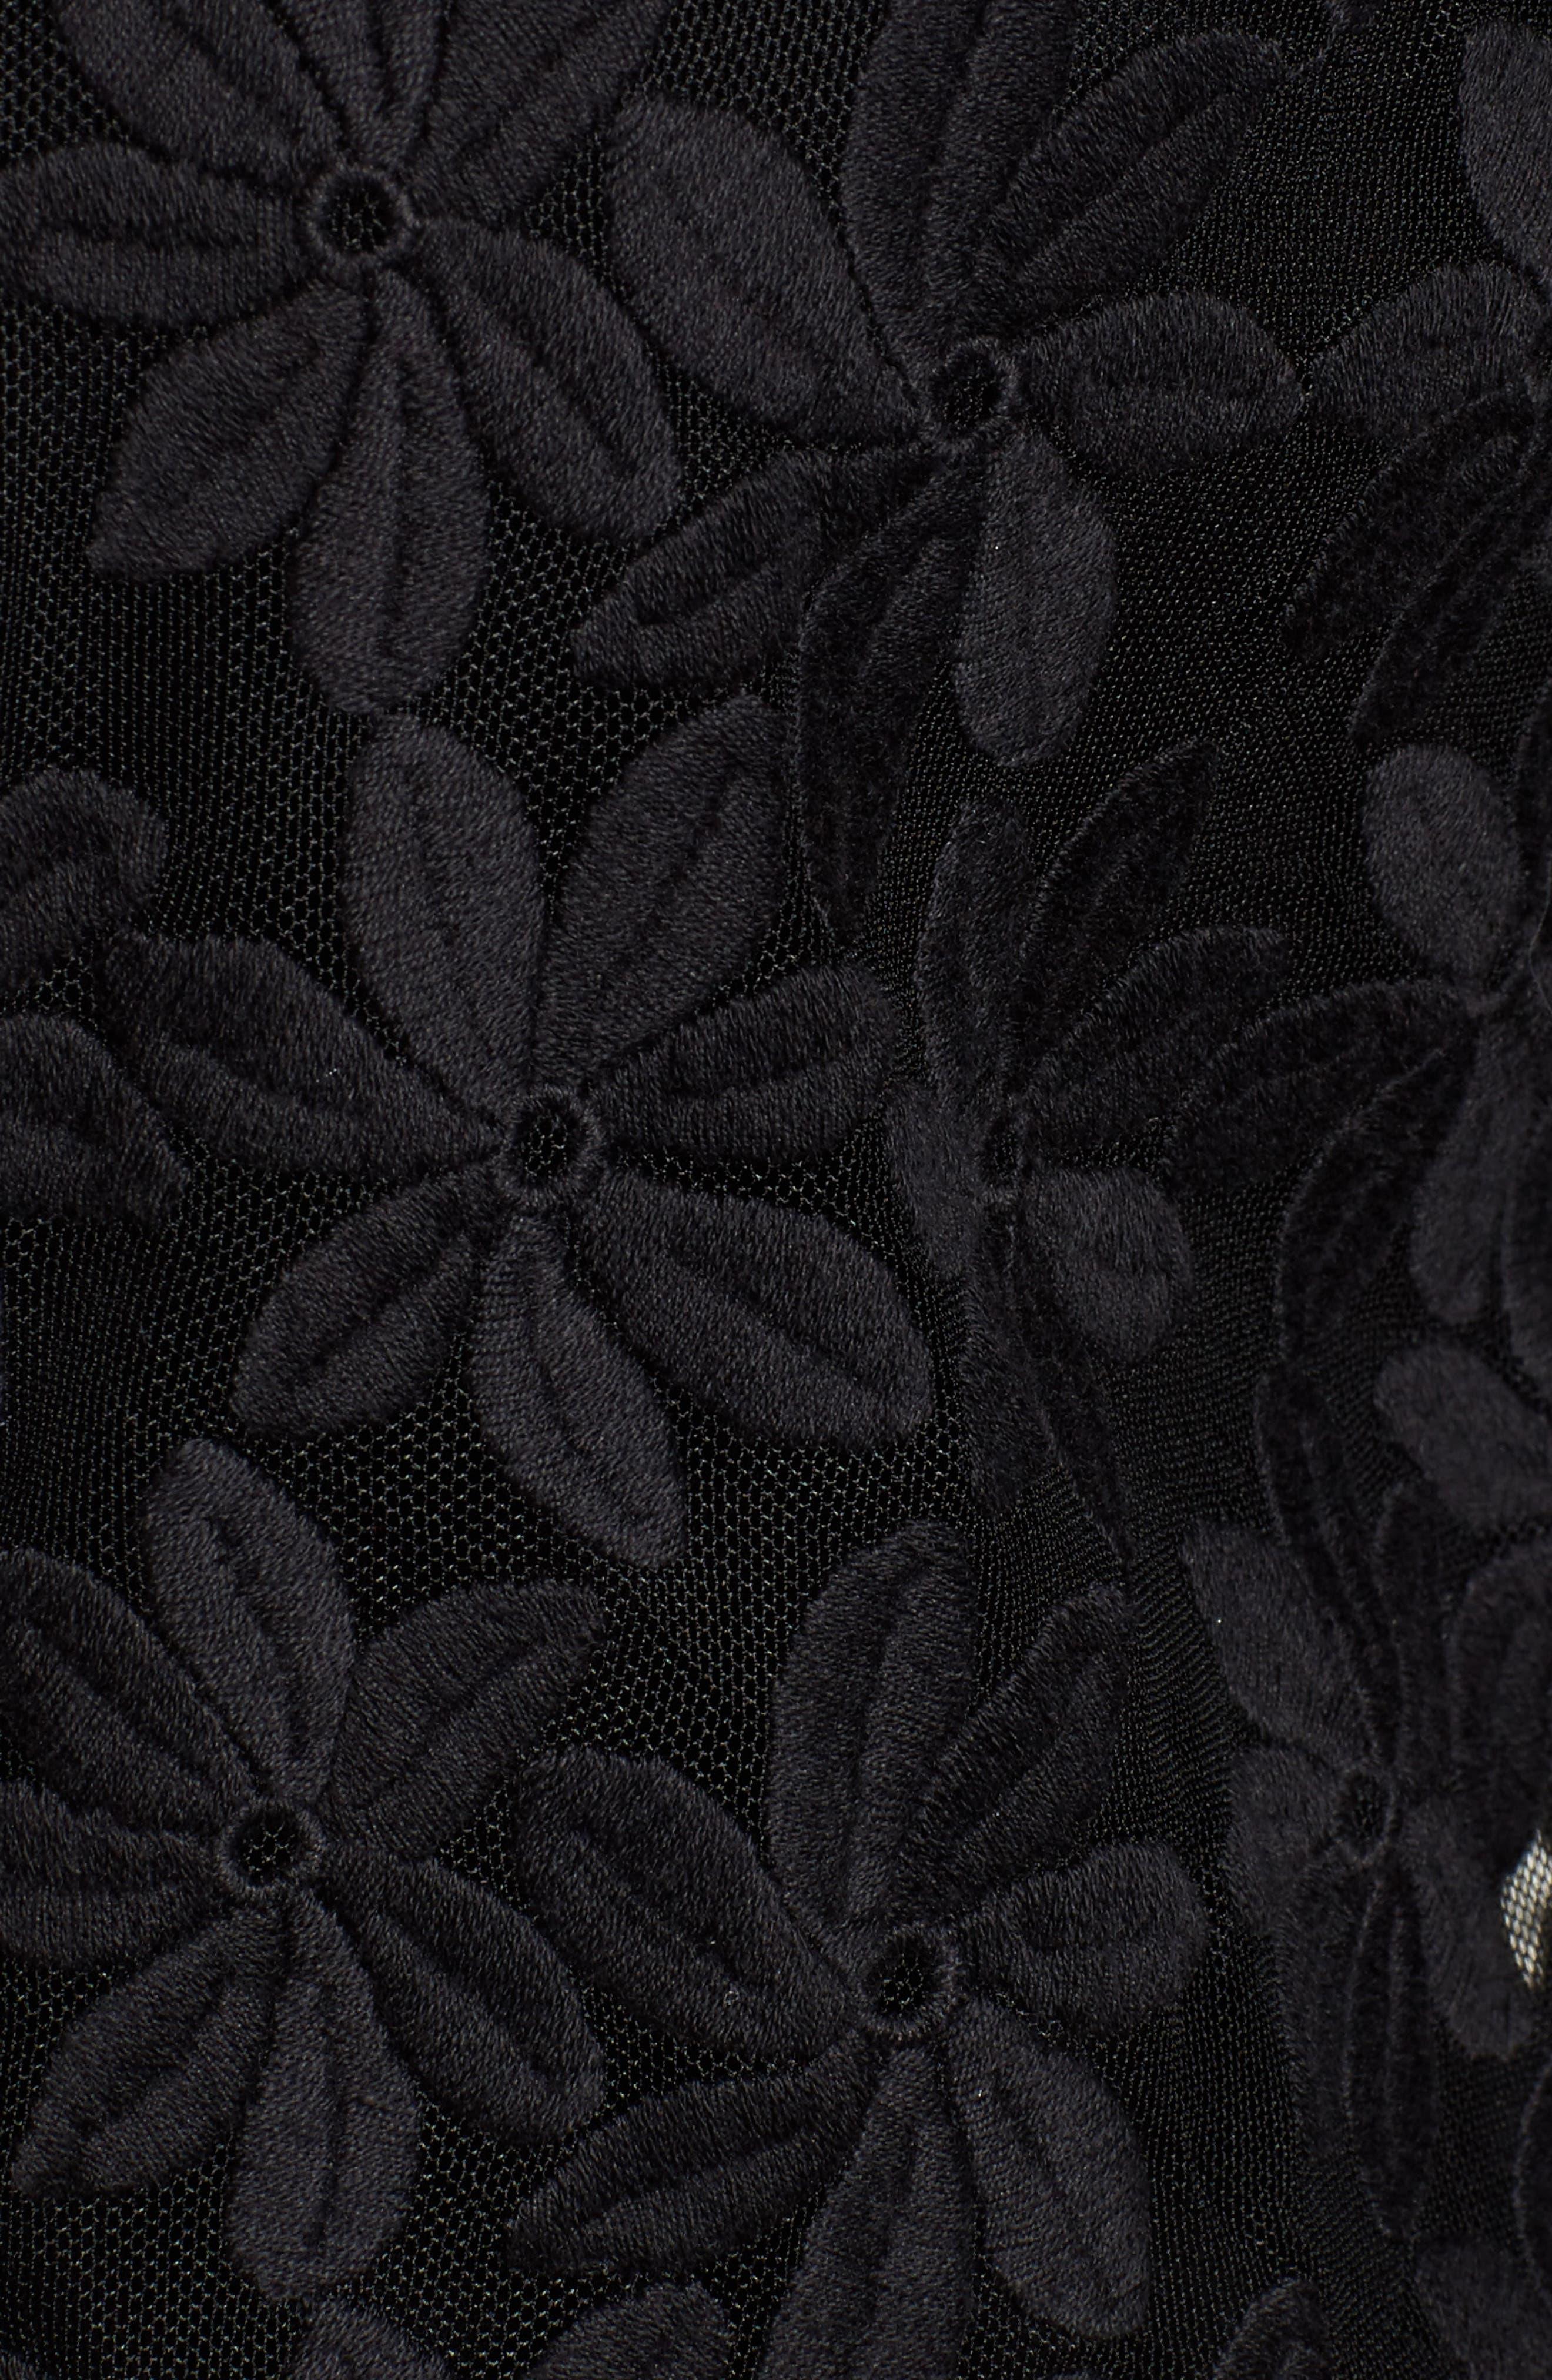 Floral Embroidered Mesh Cardigan,                             Alternate thumbnail 6, color,                             BLACK